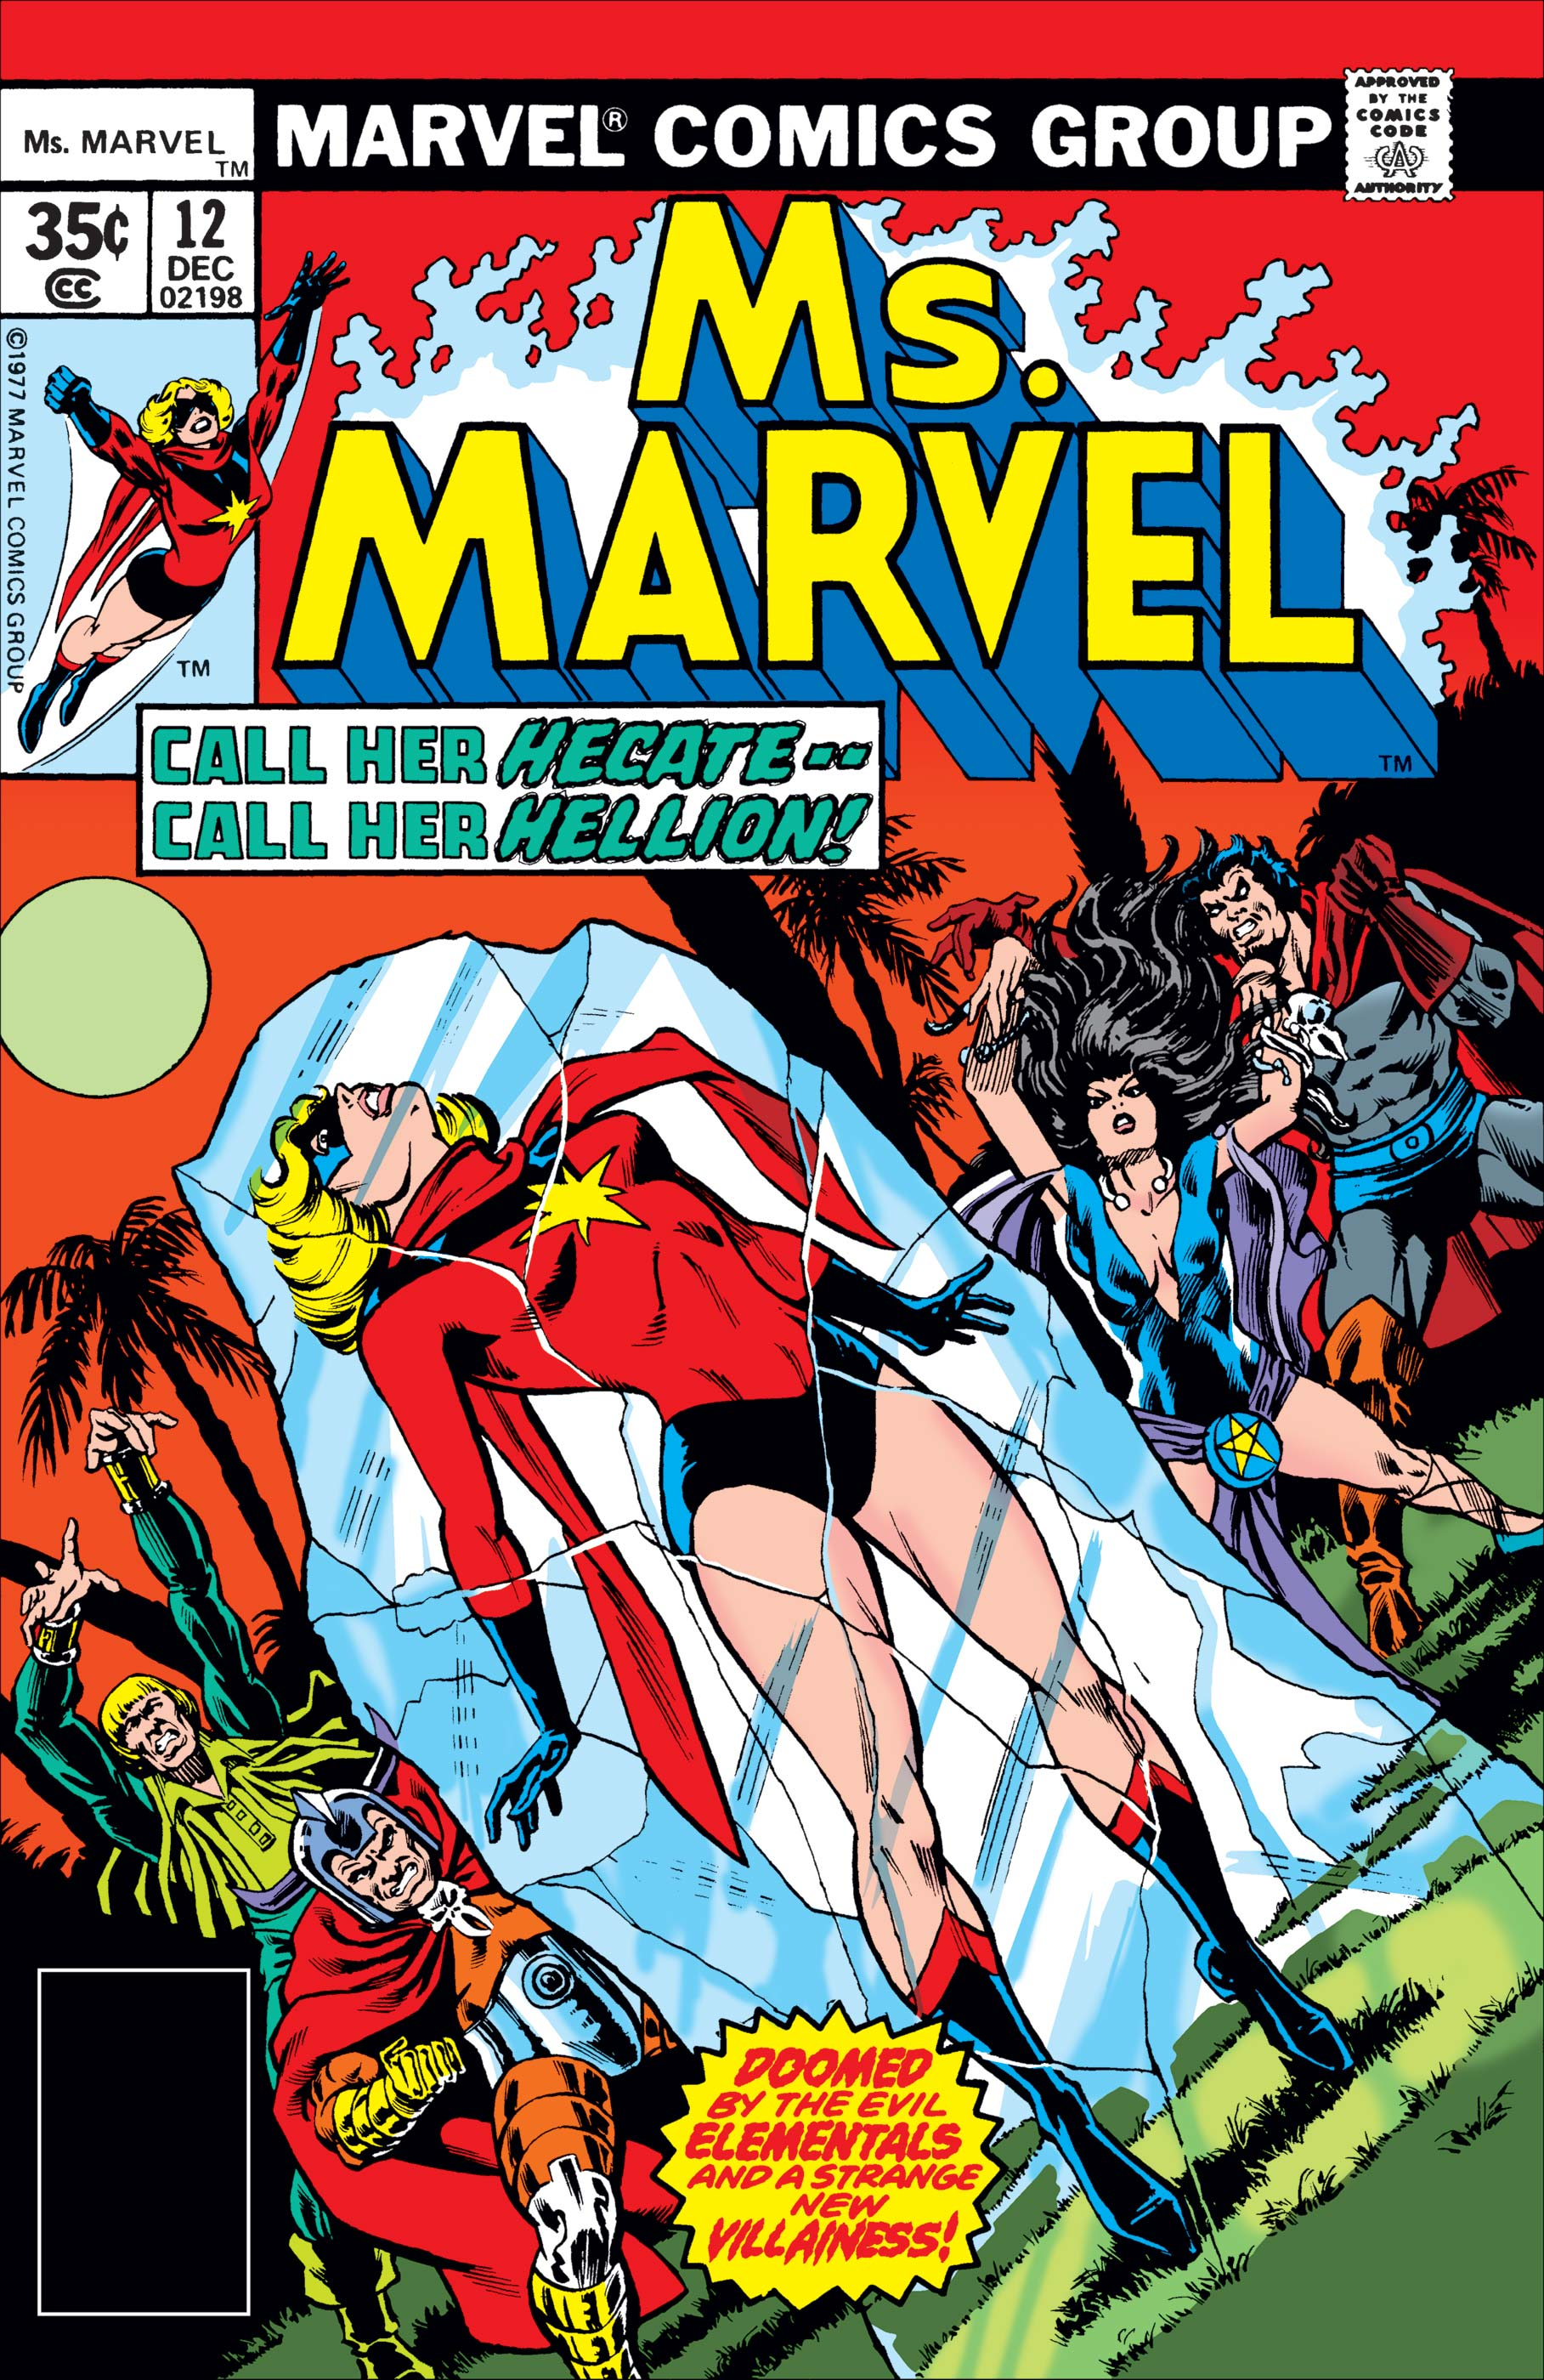 Ms. Marvel (1977) #12